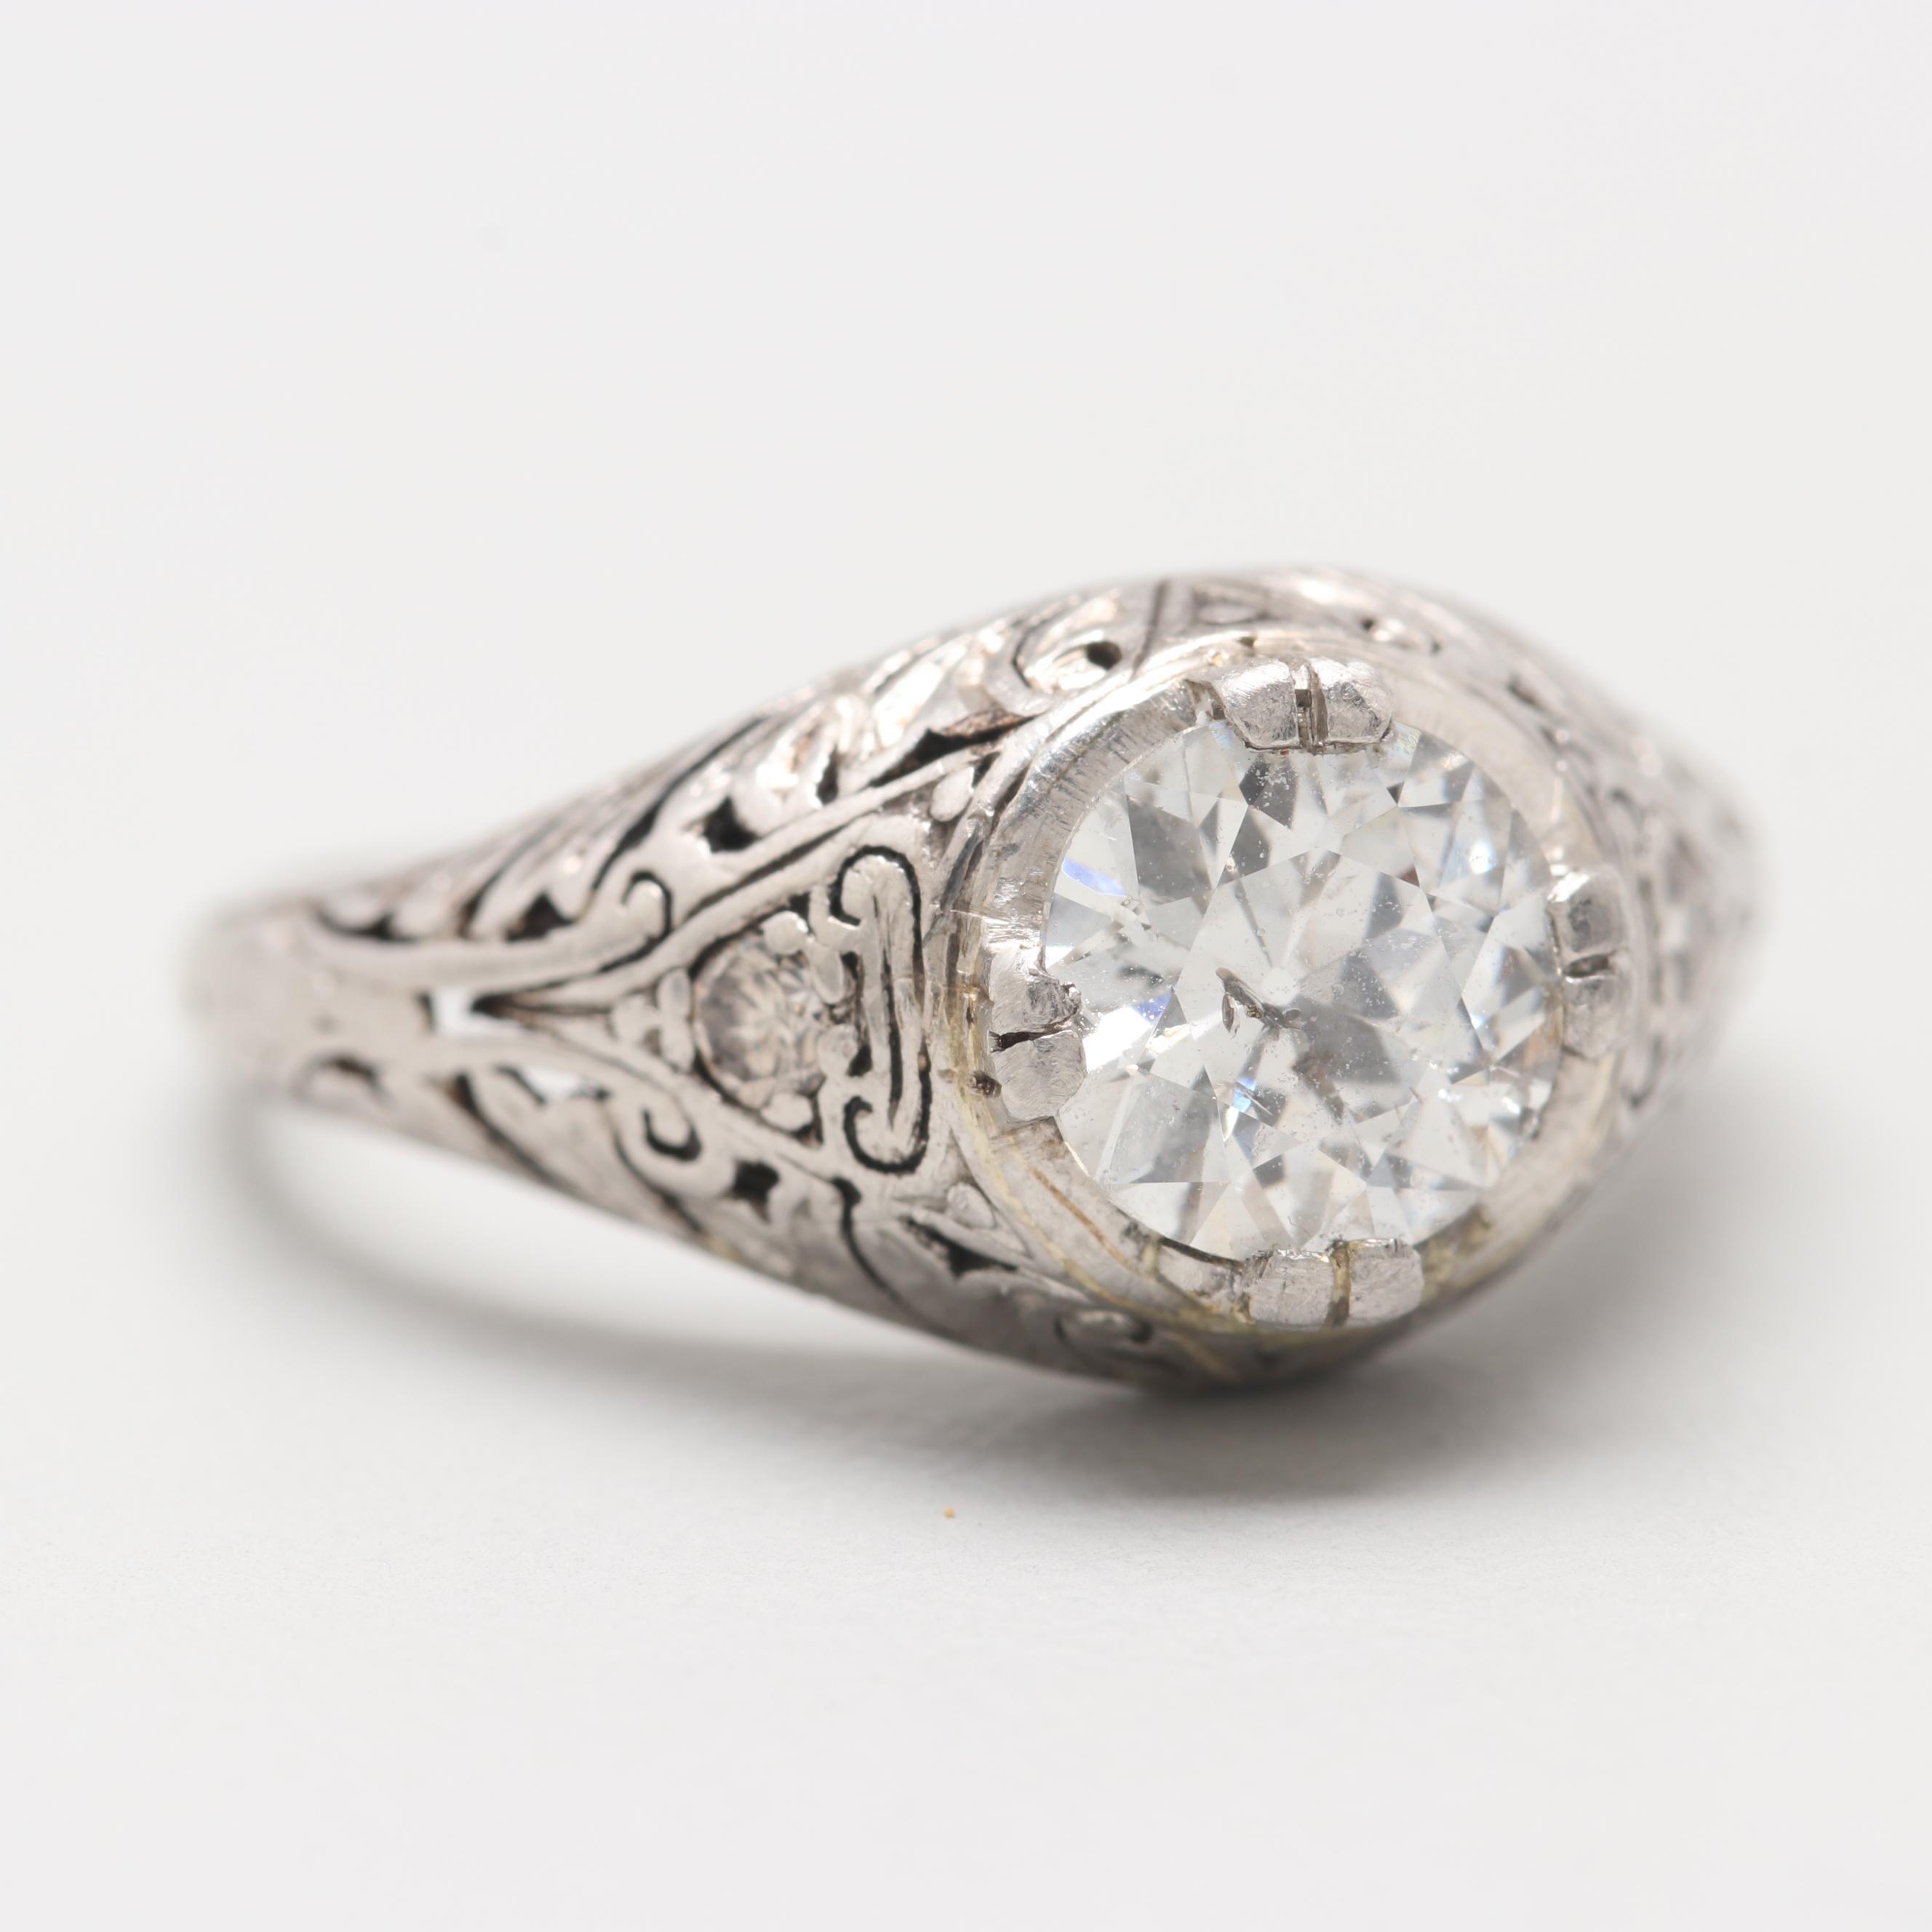 Edwardian 18K White Gold and Platinum 1.03 CTW Diamond Ring